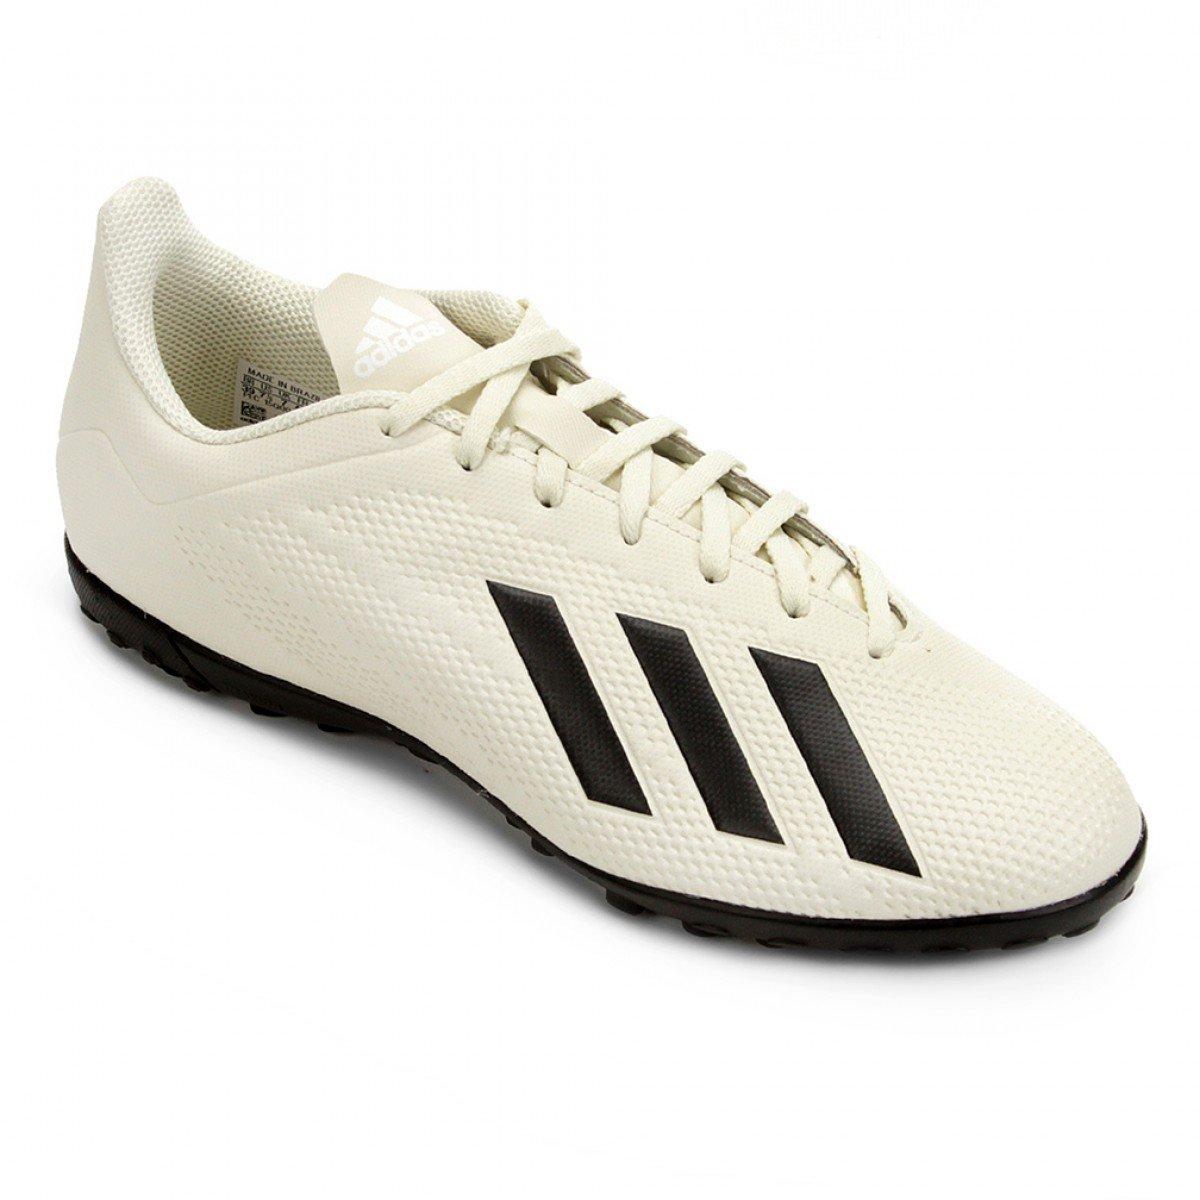 Chuteira Society Adidas X Tango 18 4 TF Masculina - Branca e Preta ... 2f45bb1253e0c